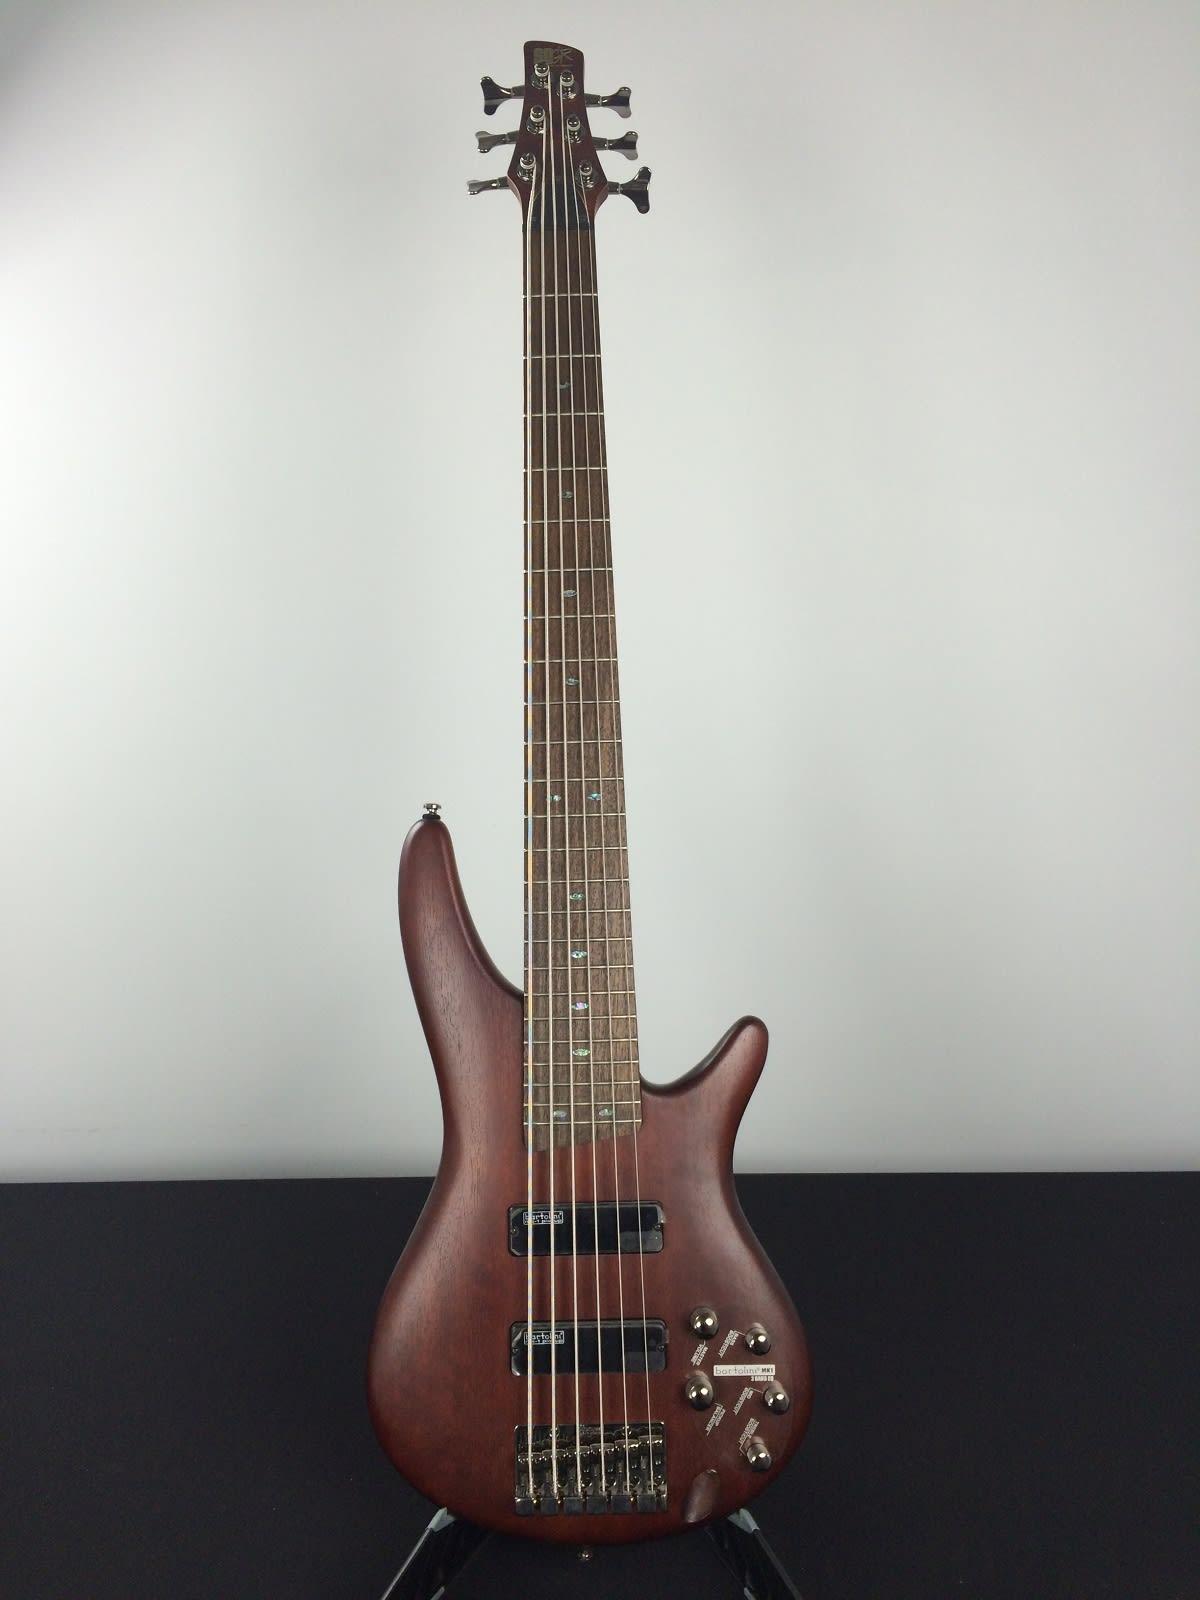 ibanez sr506 sound gear 6 string bass guitar brown mahogany reverb. Black Bedroom Furniture Sets. Home Design Ideas